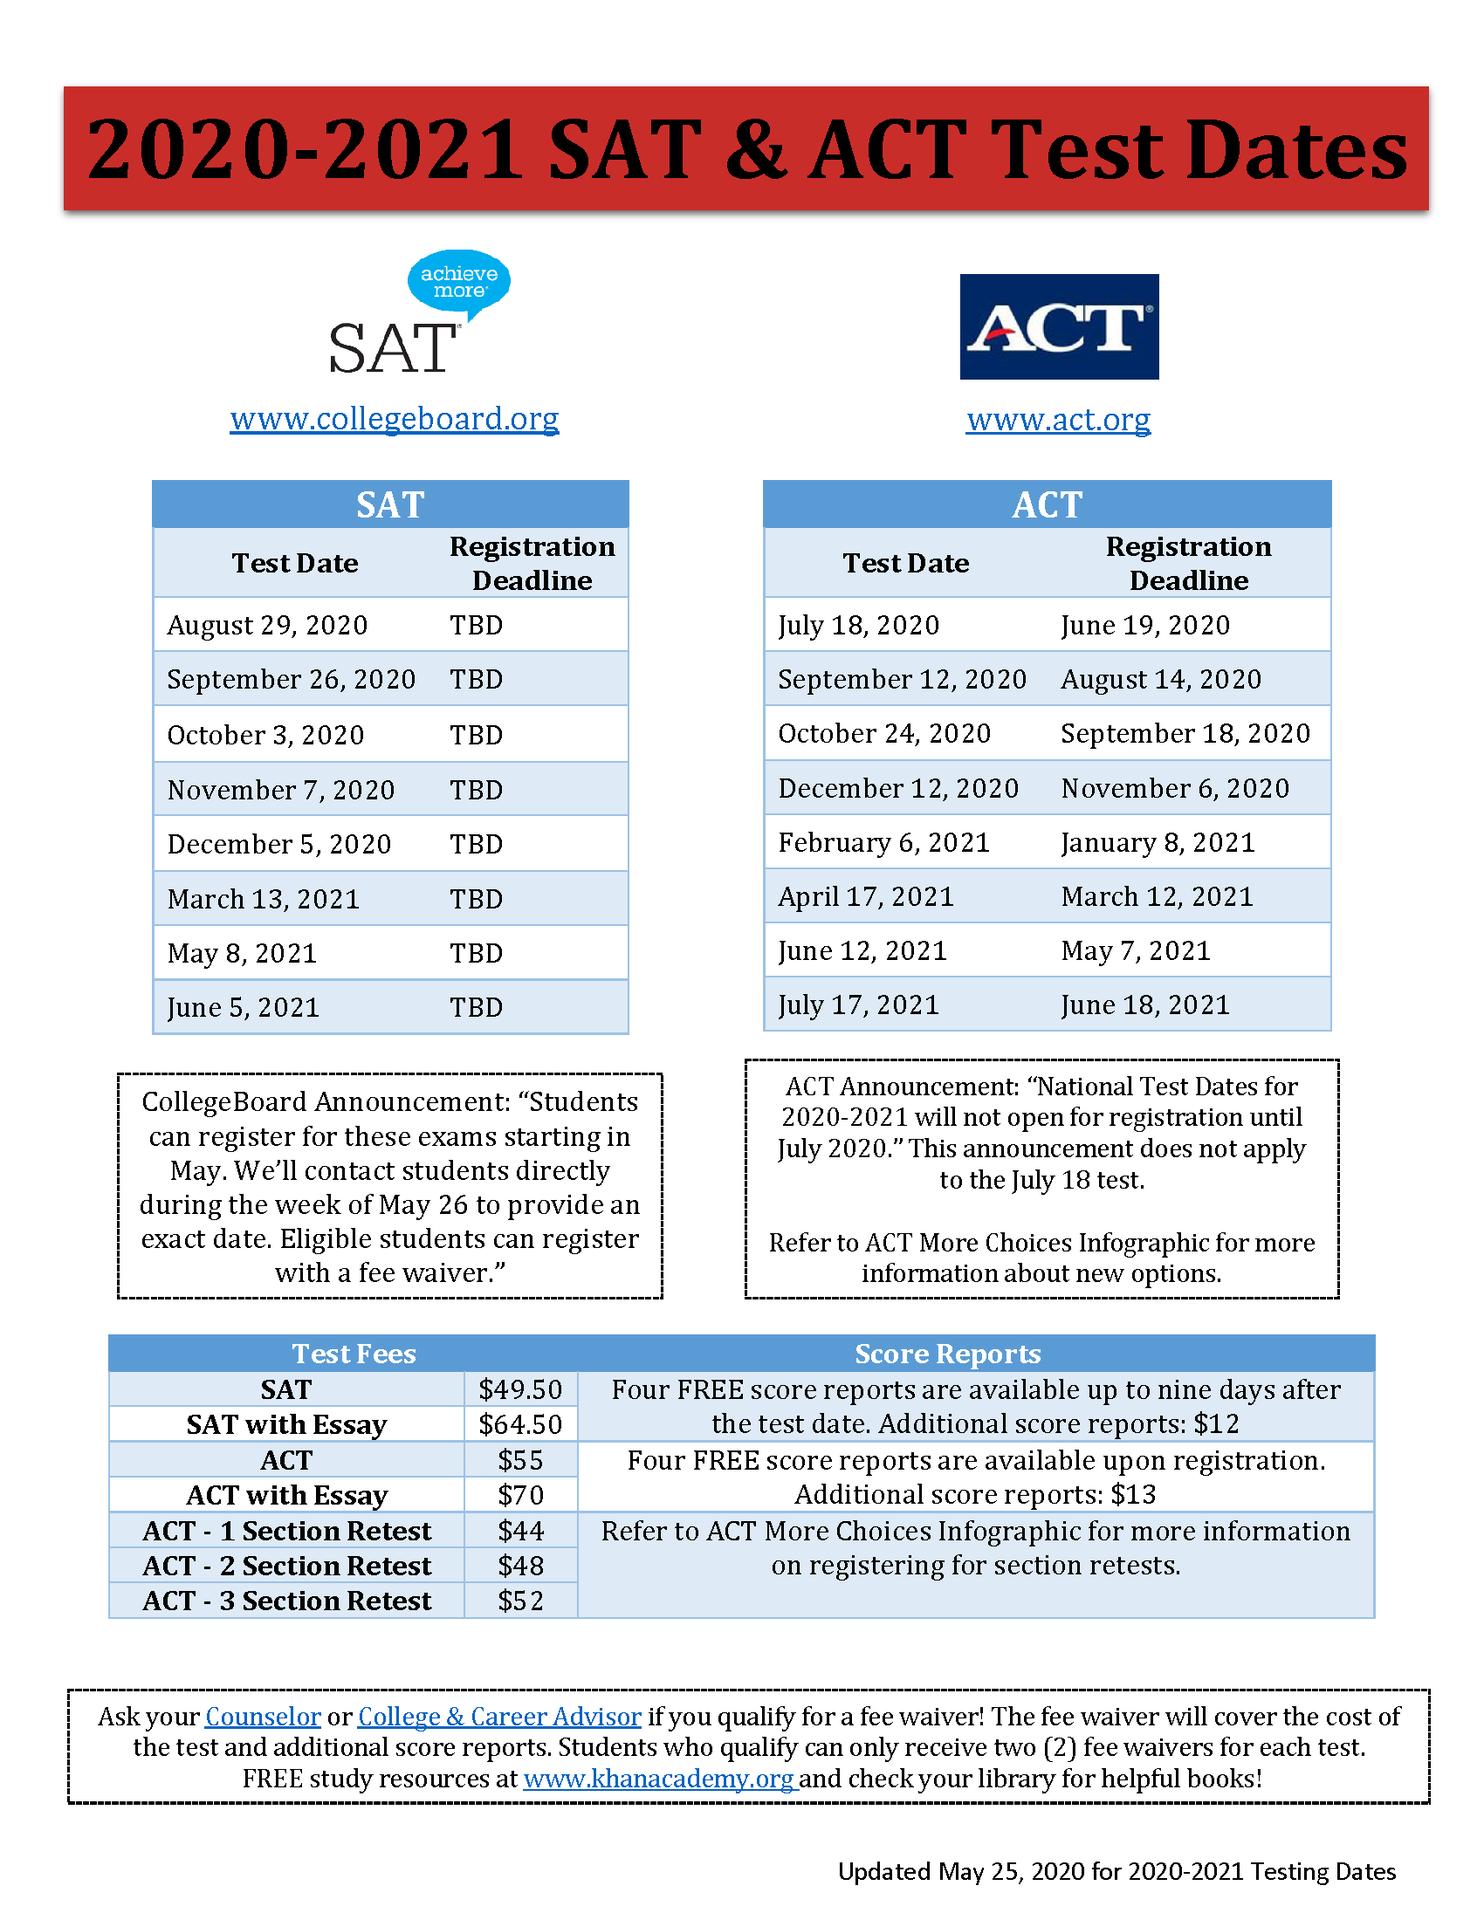 SAT/ACT Test Dates 20-21